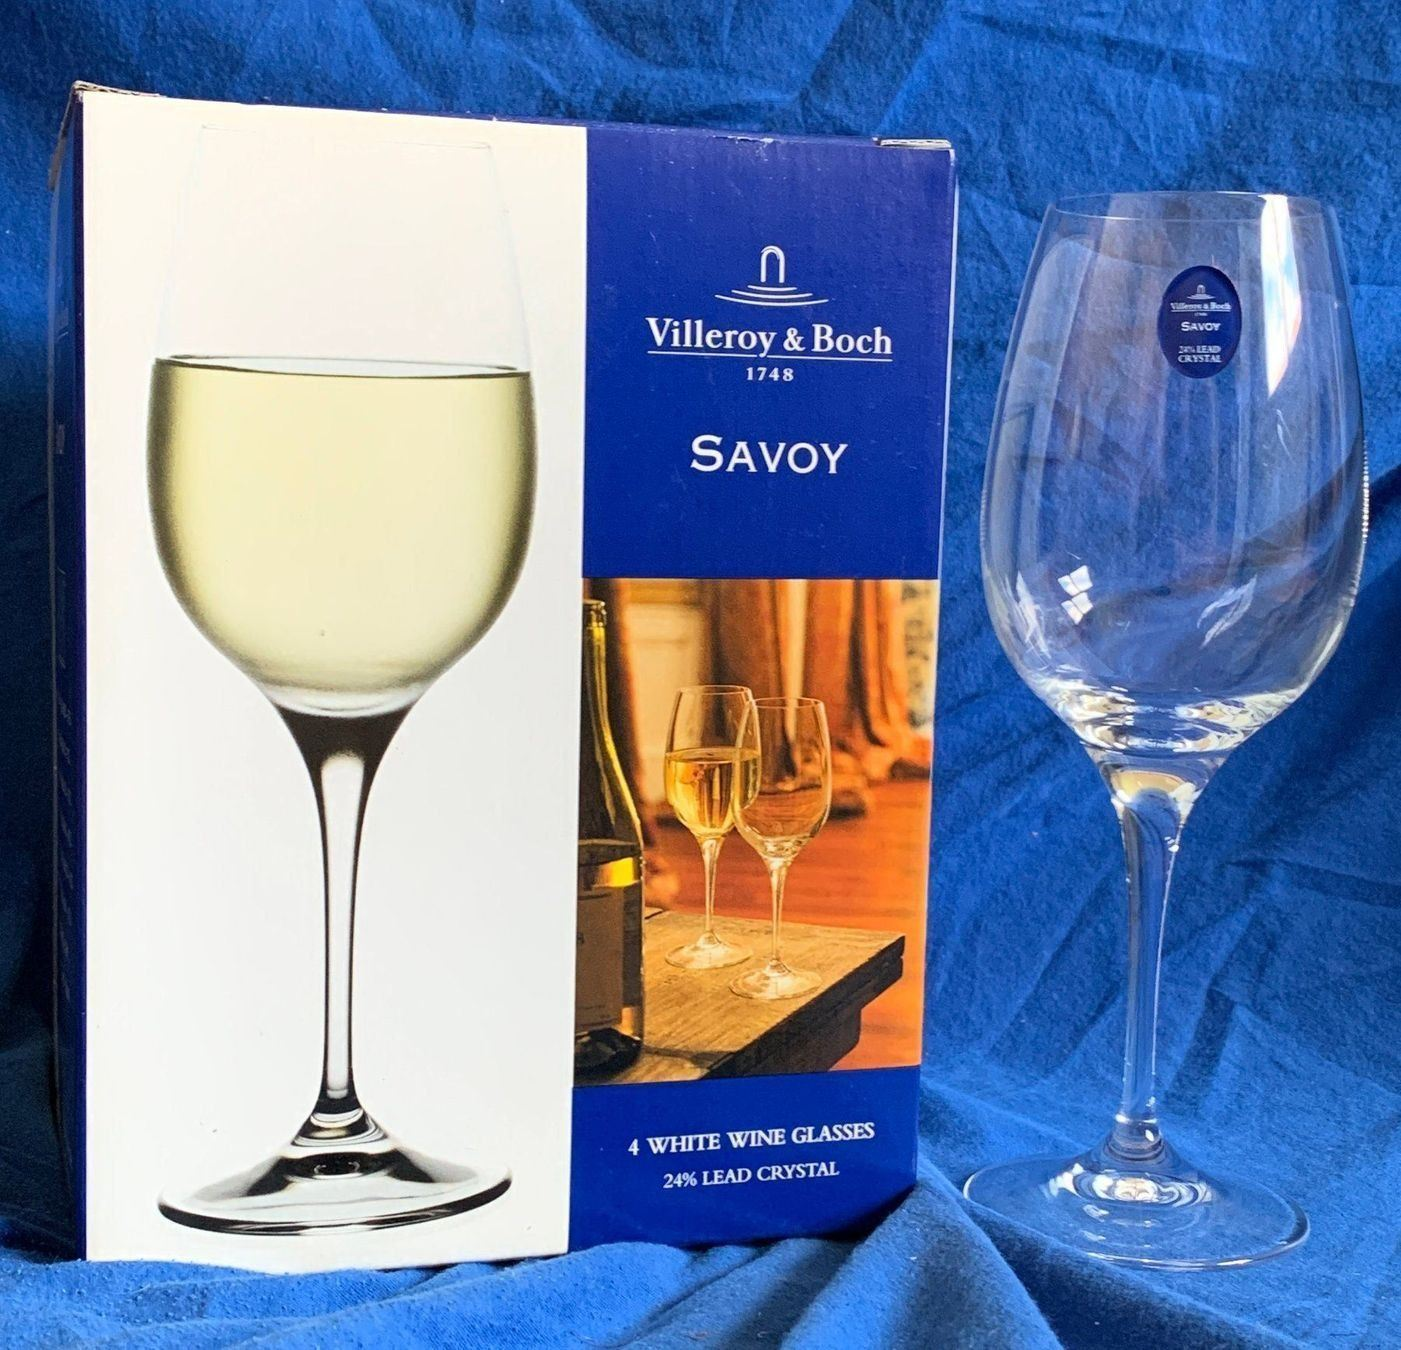 Villeroy & Boch  Savoy   White Wine Crystal Glasses - Set of 4